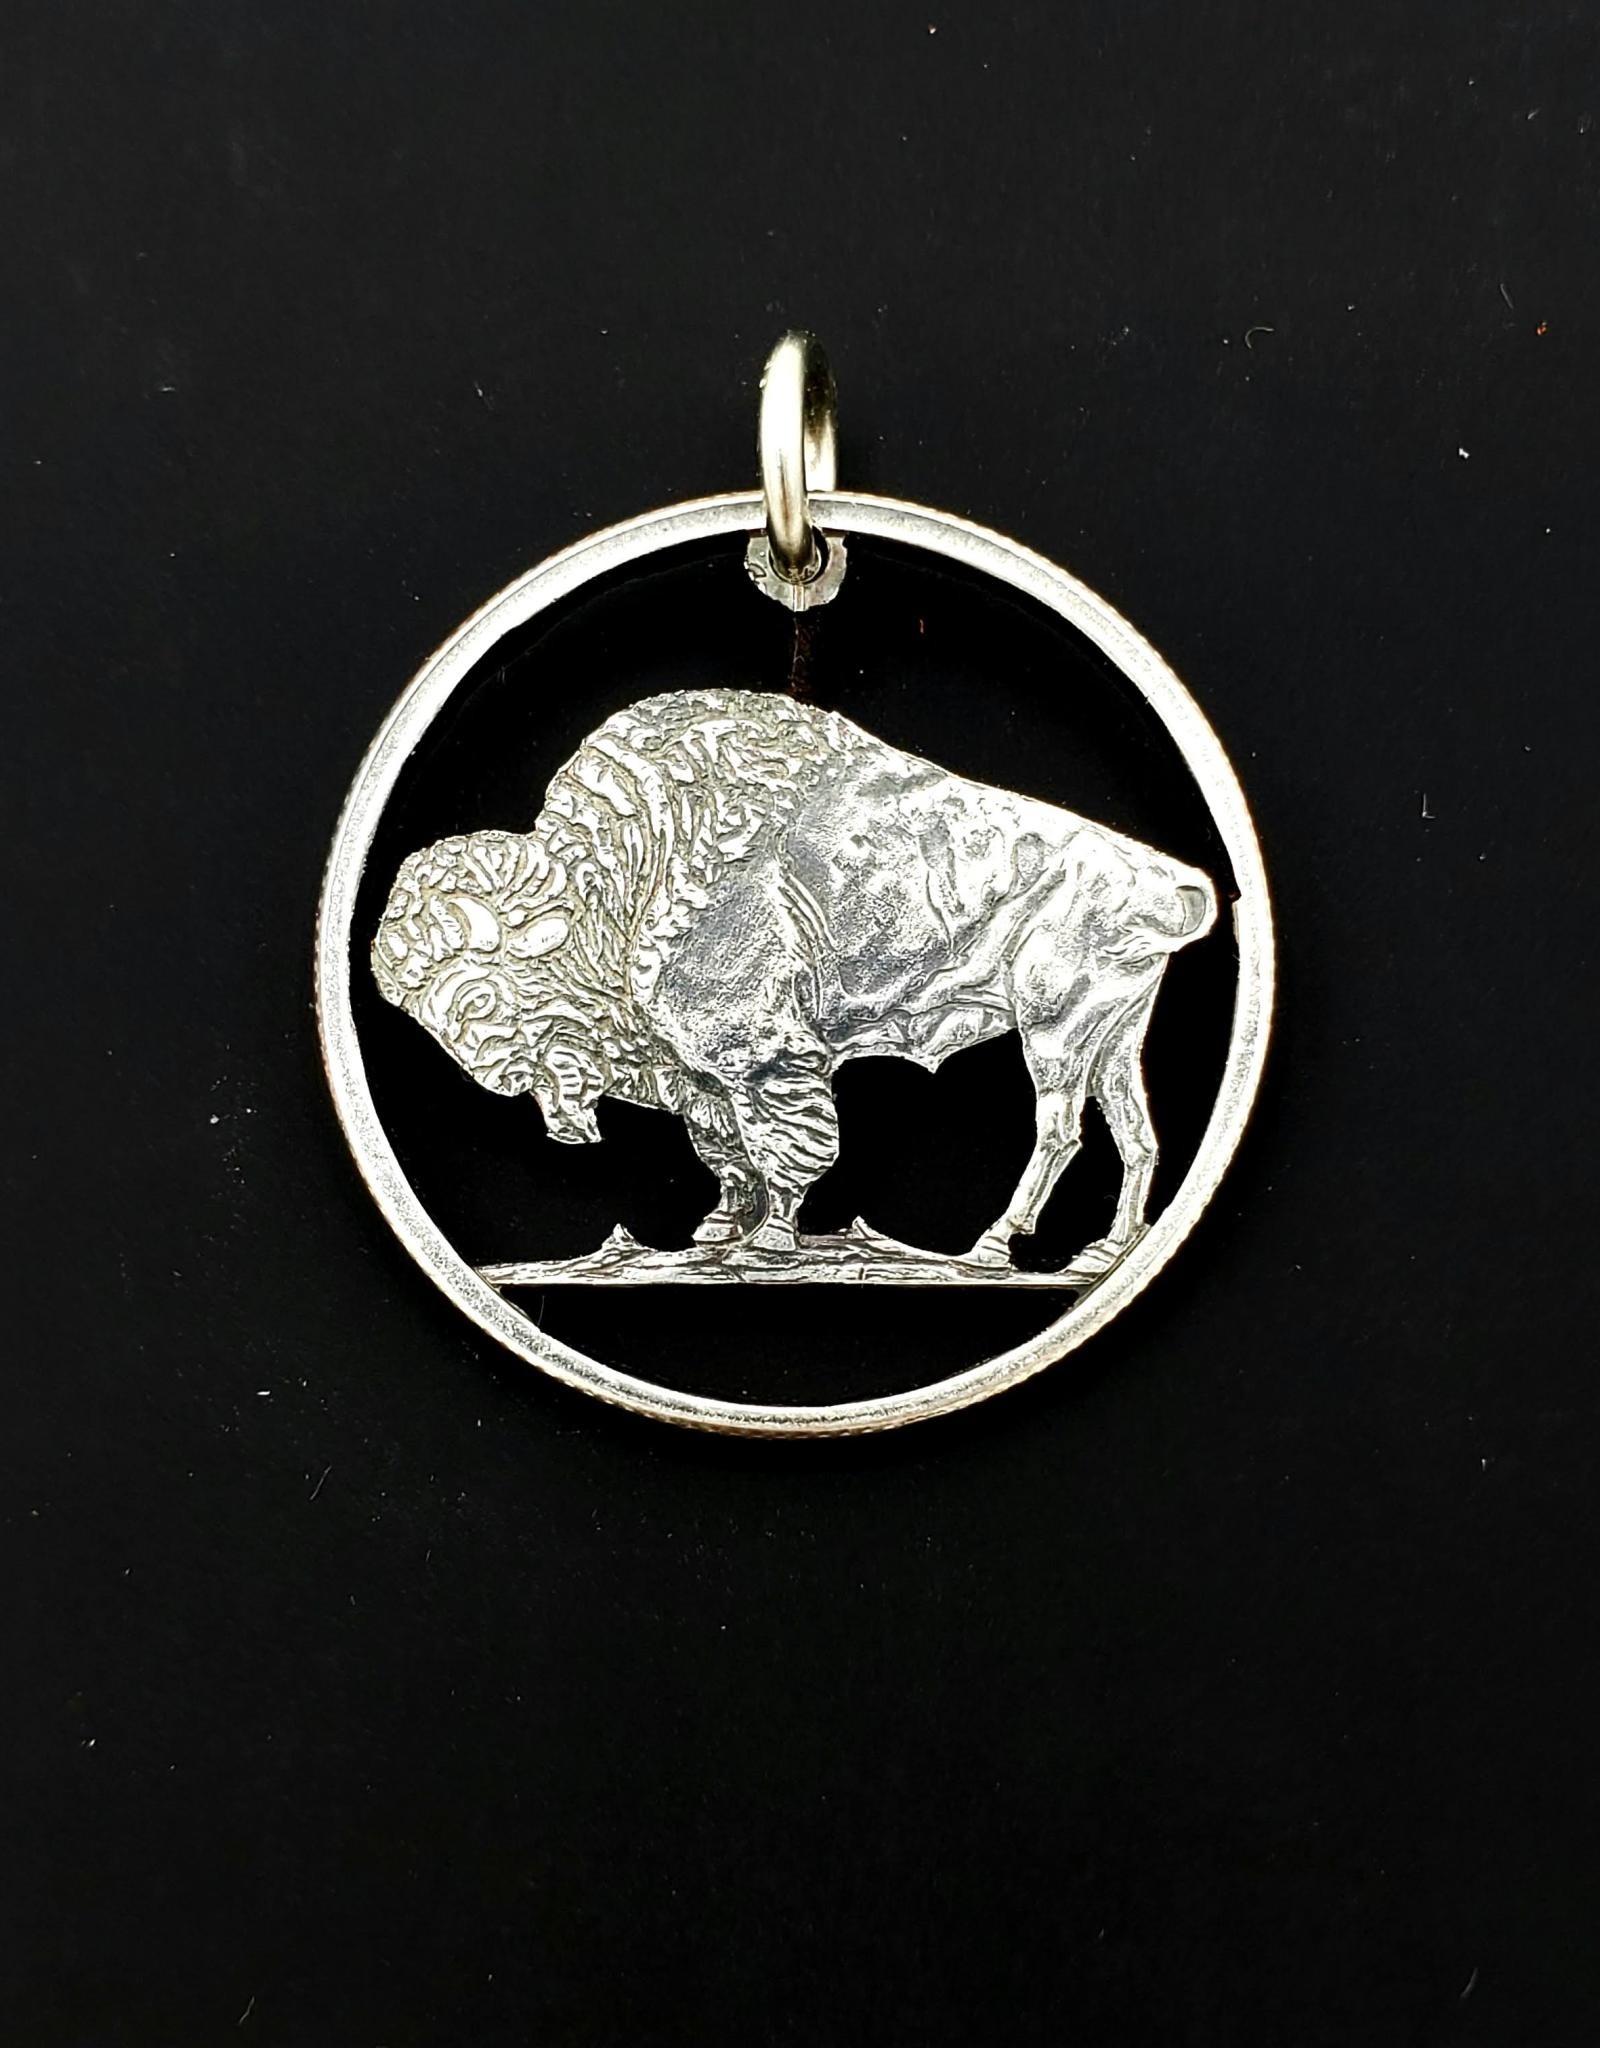 Lazy Cat Cut Coins Hand-cut Coin Pendant - Buffalo quarter